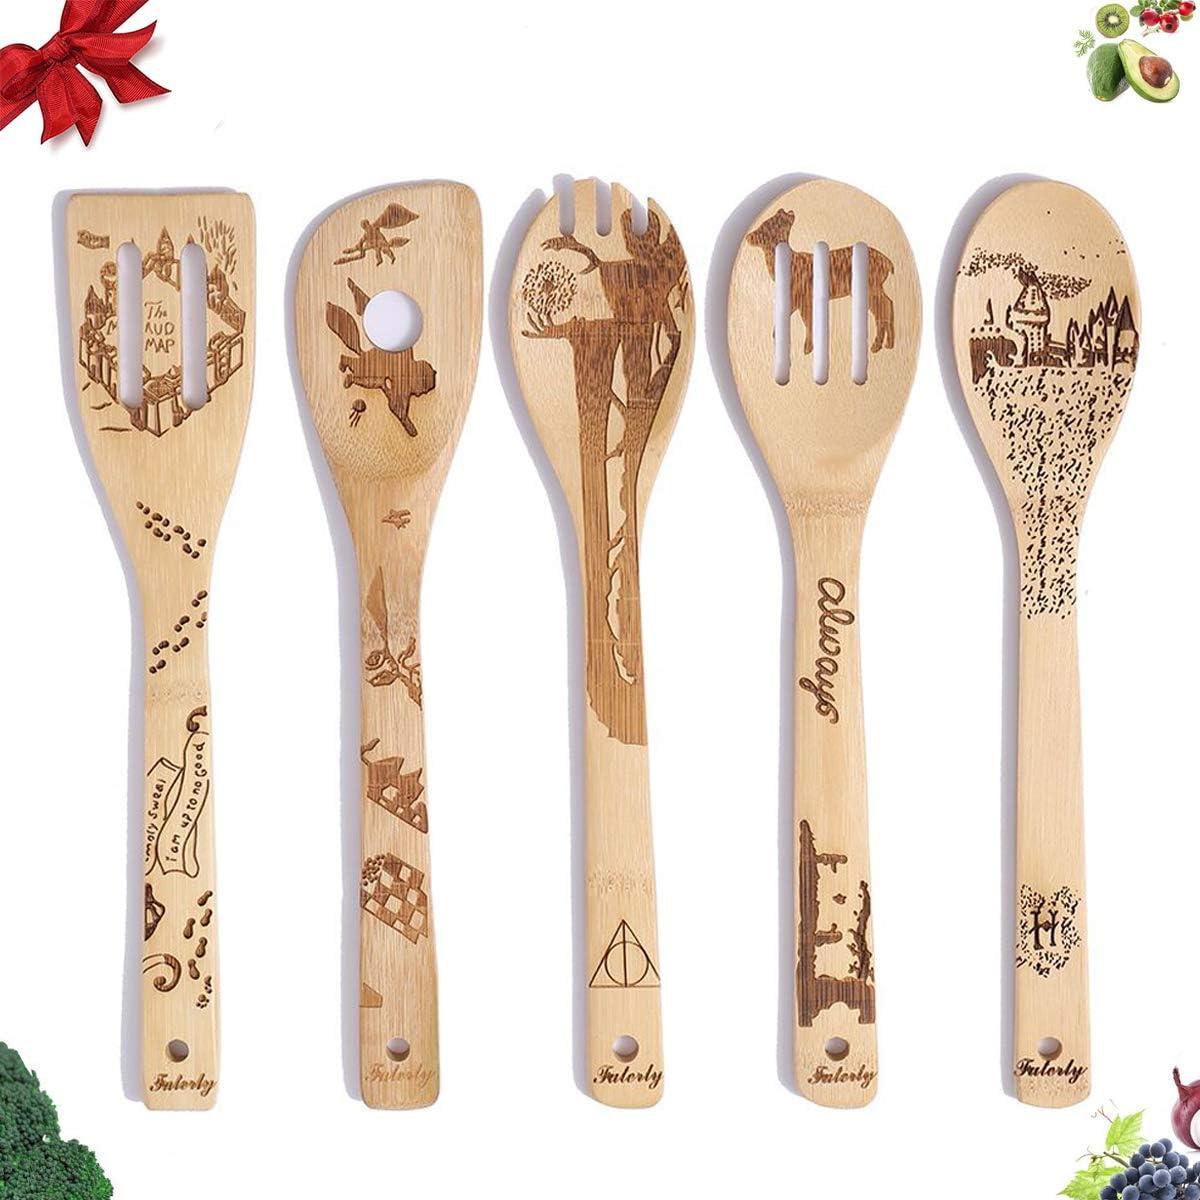 Dacestar 5 PCS Wooden Cooking Spoon Set,Magic Kitchen Utensils Set Cooking Spoons,Non-stick Bamboo Utensil Set